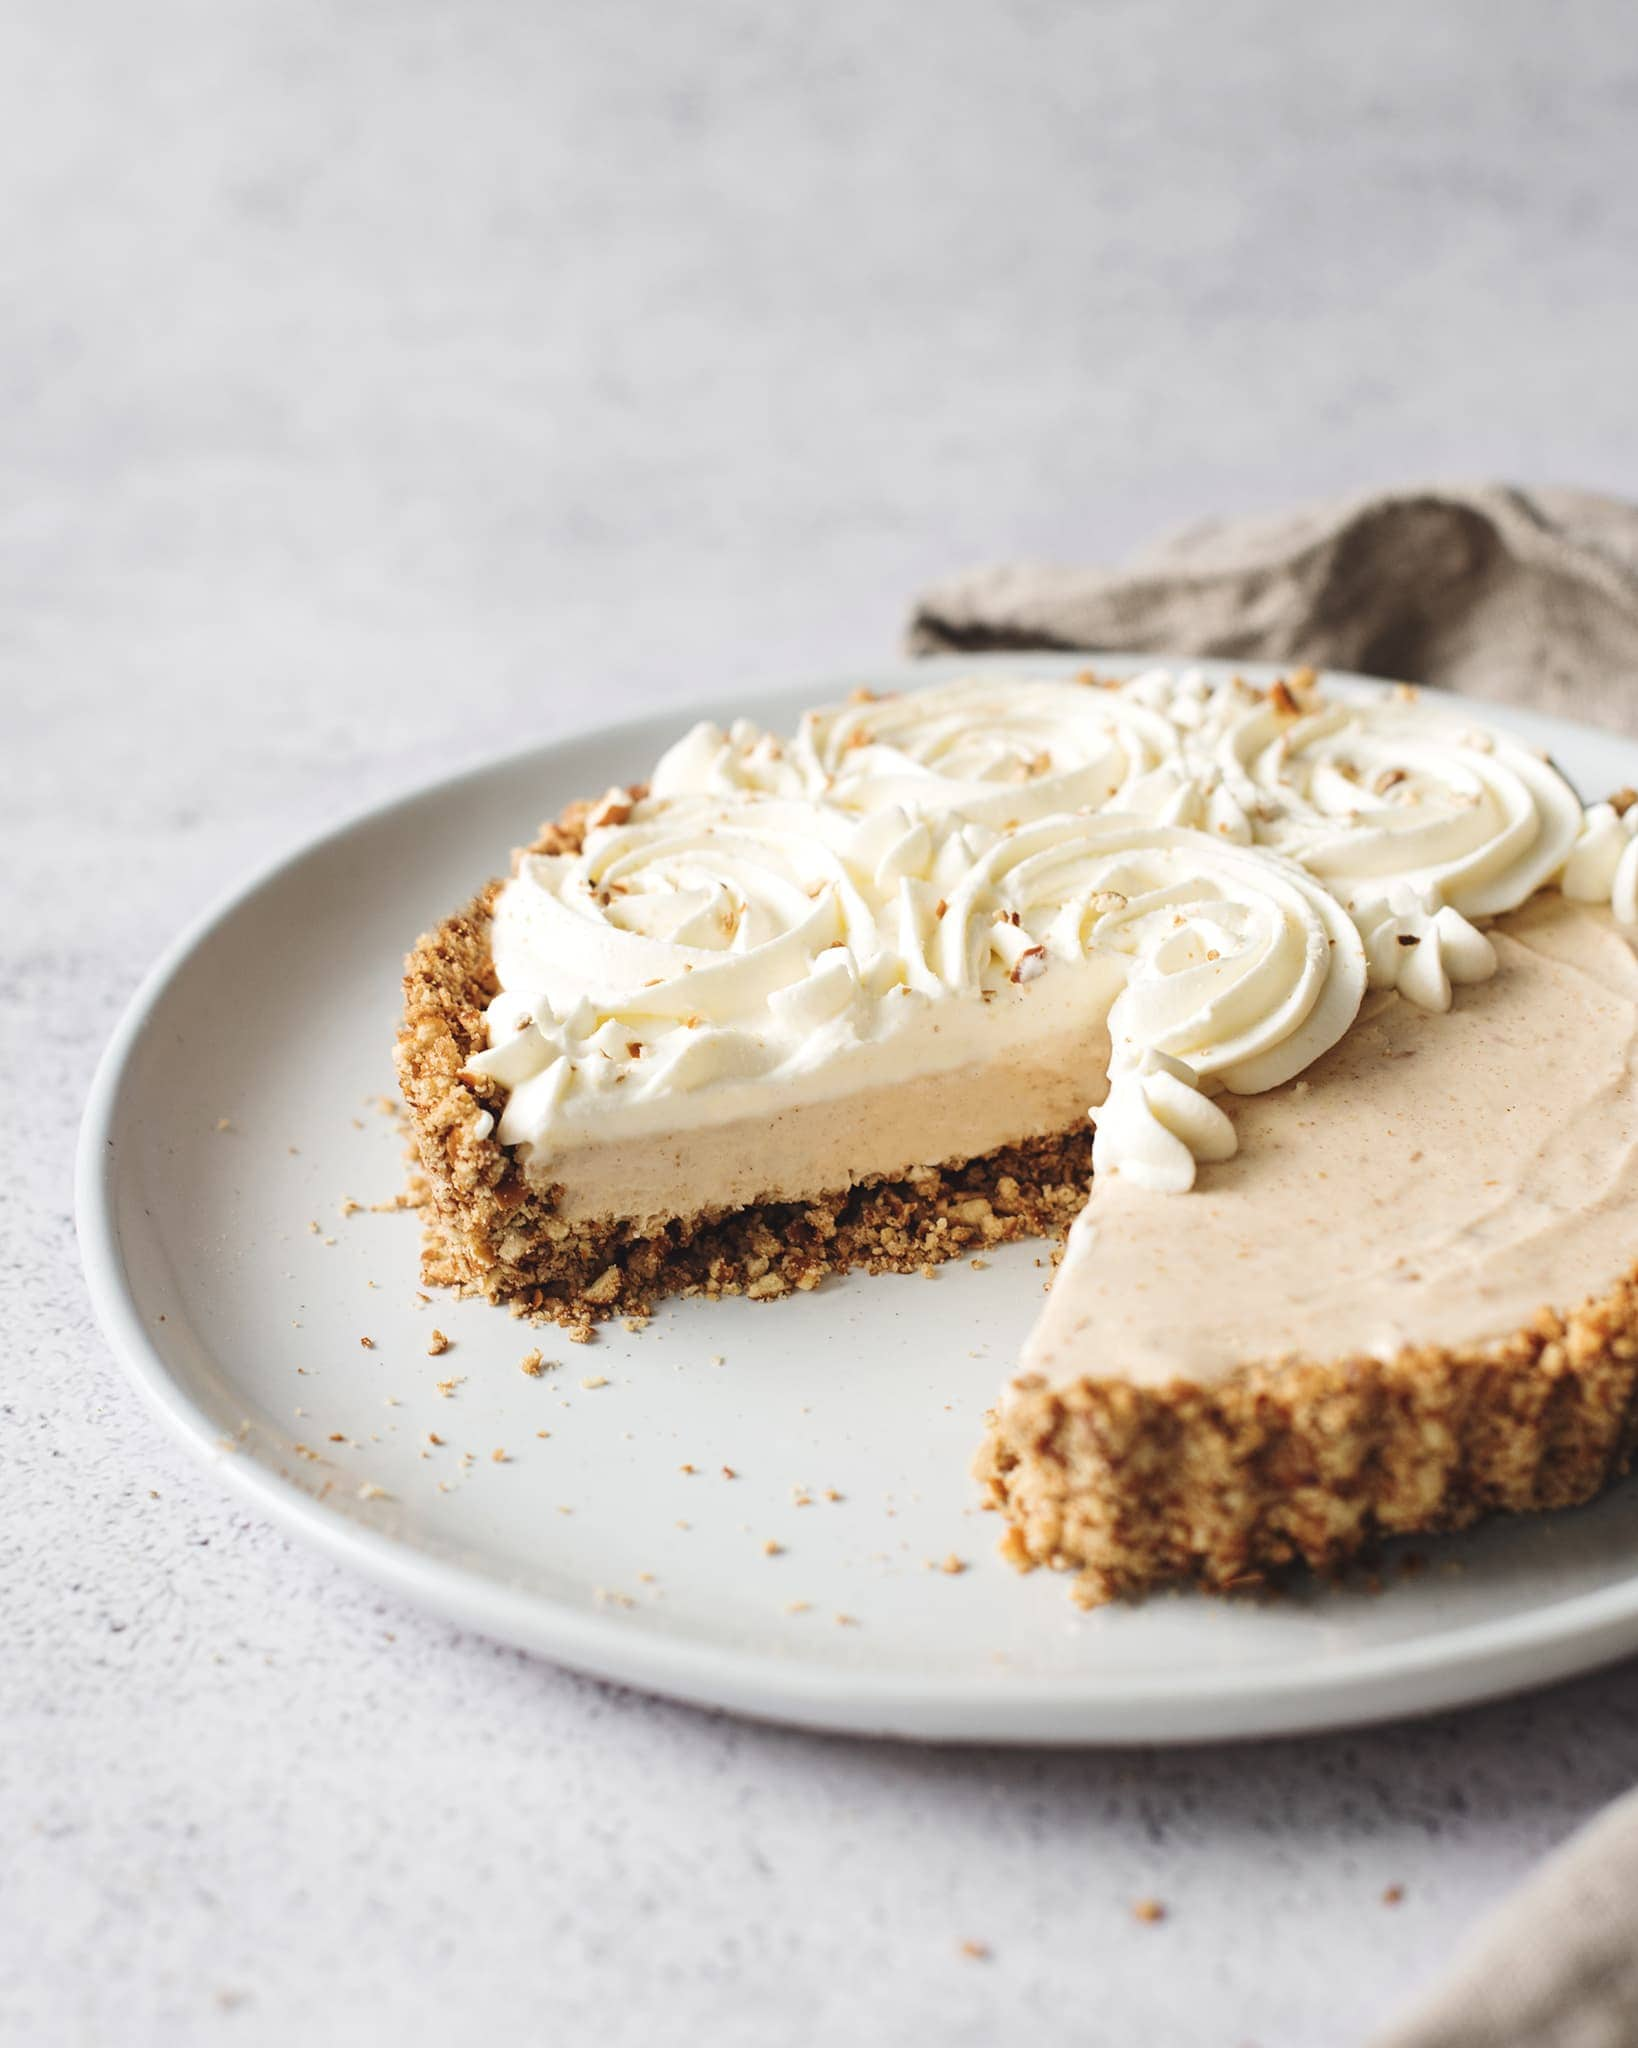 Close up of cut edge of a peanut butter ice cream pie